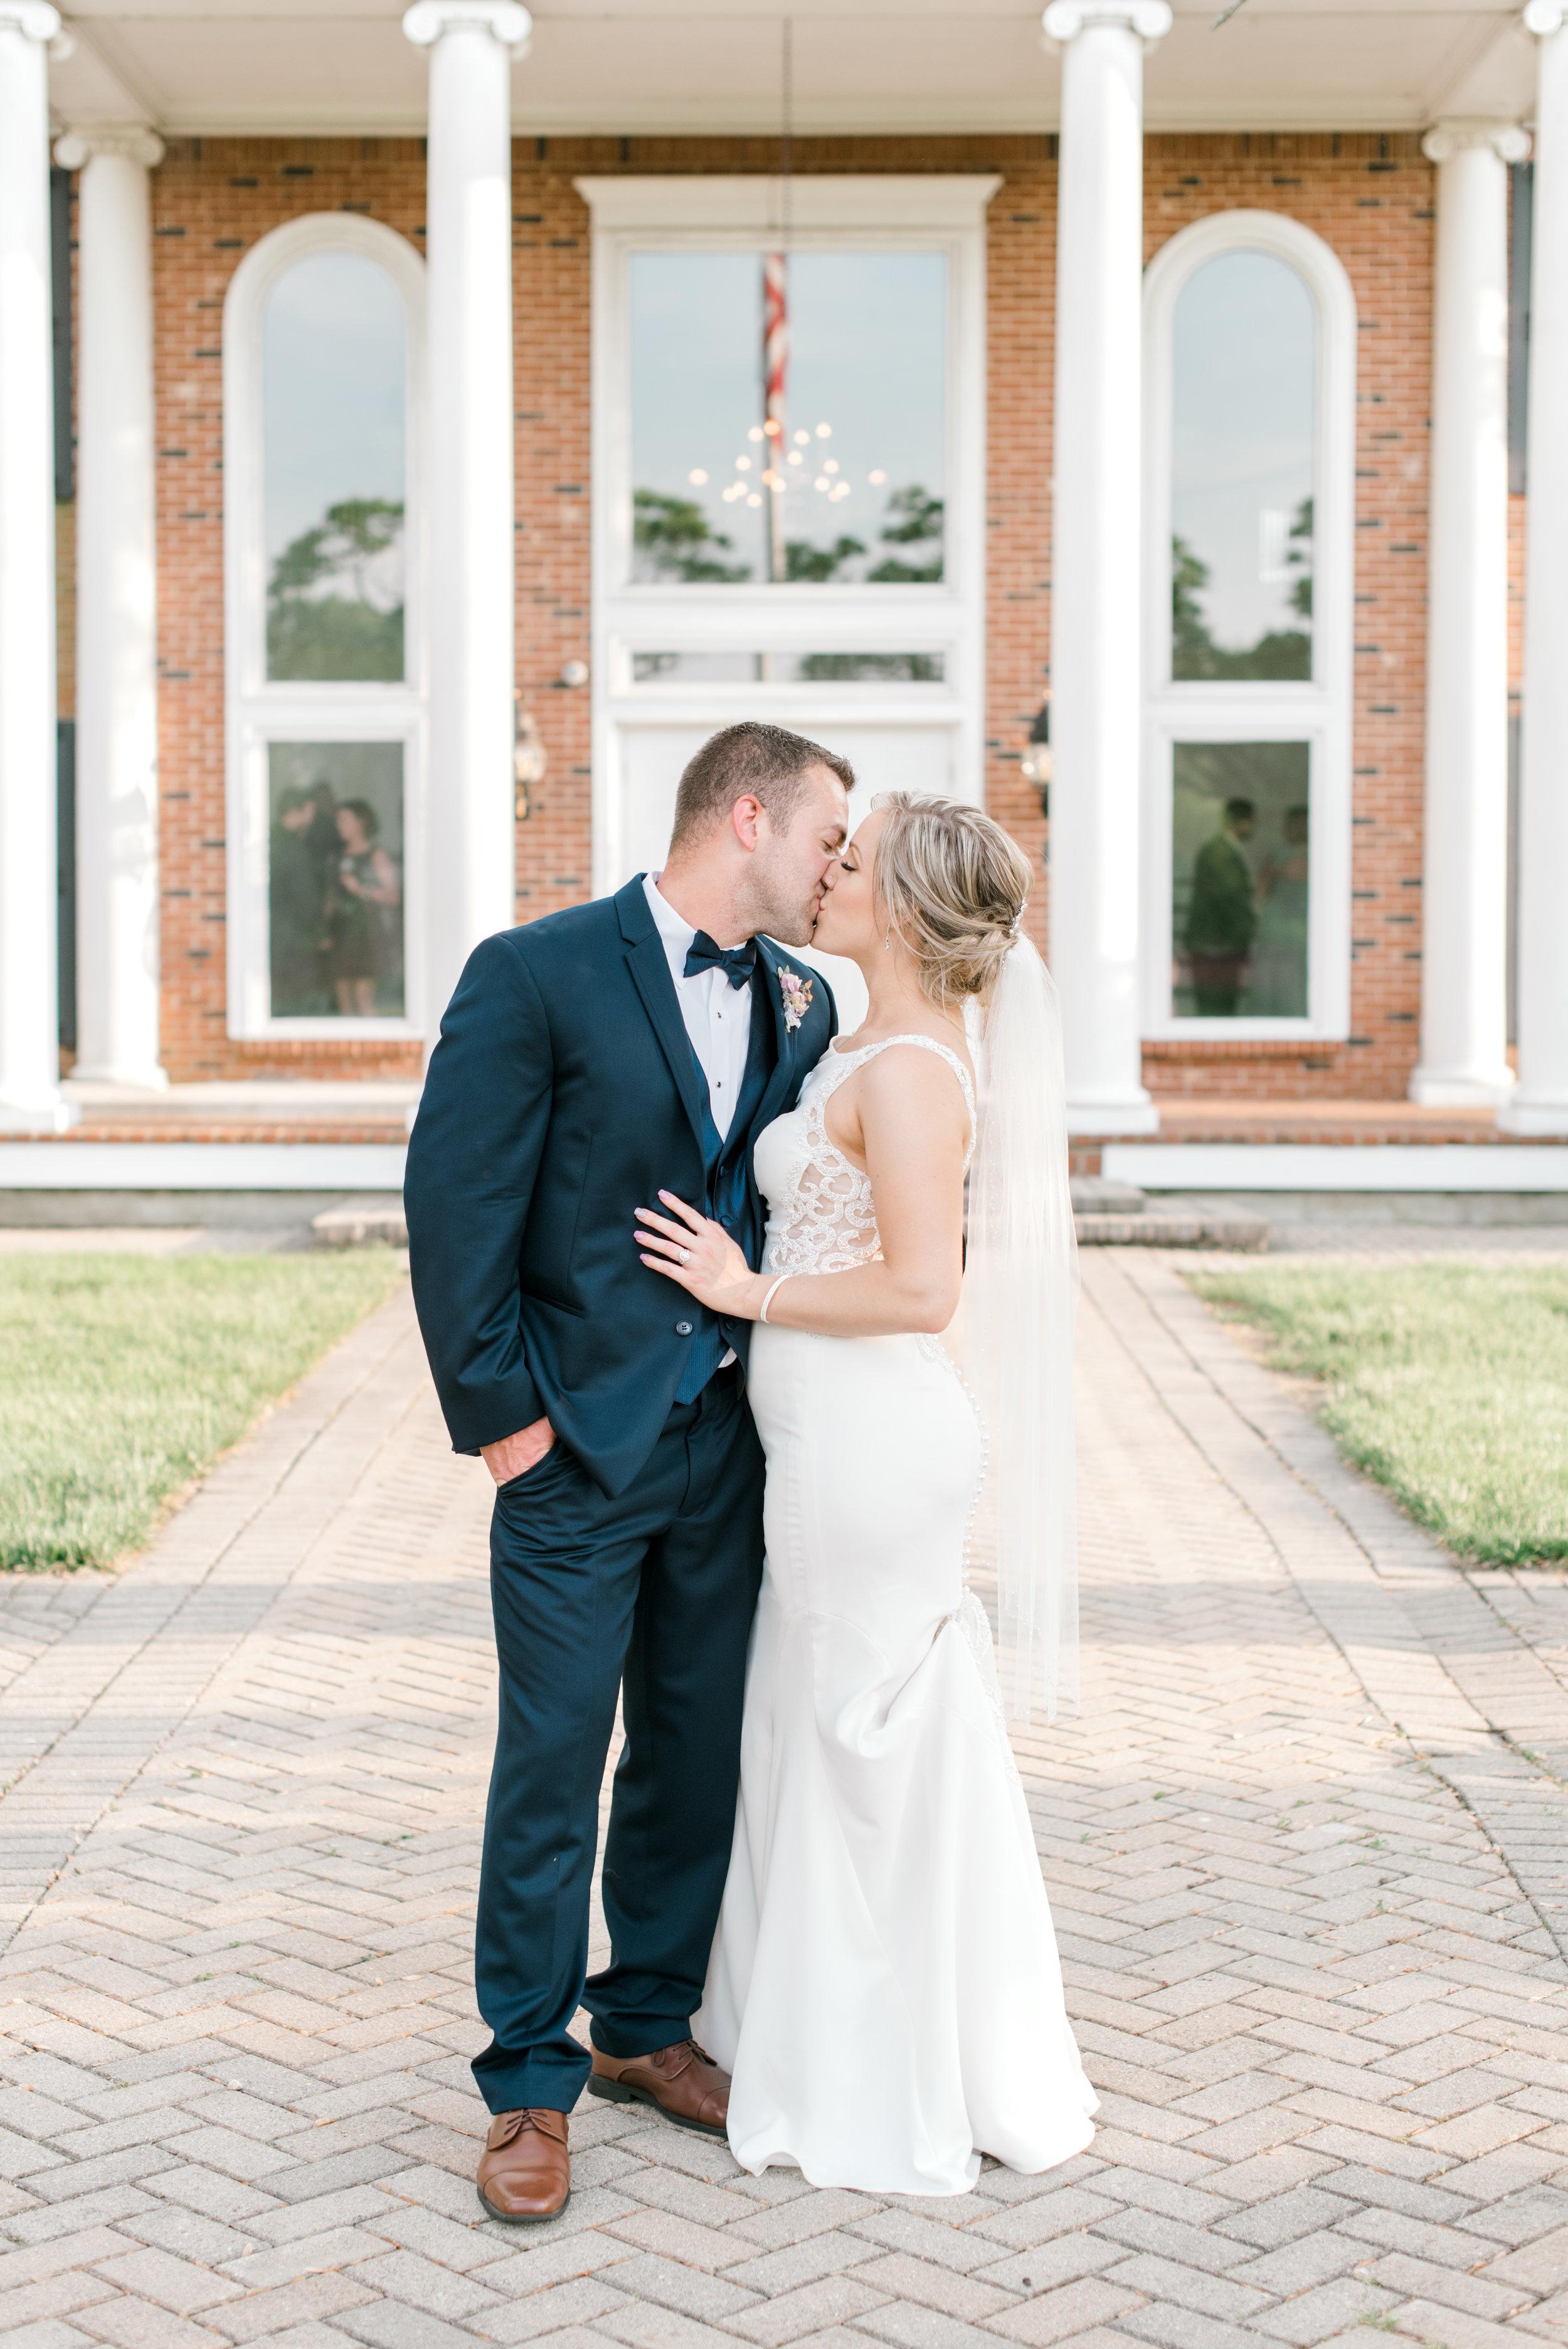 Bre + Dan's Wedding 2019 Chapel Lane Photography Cincinnati Ohio (16 of 21).jpg